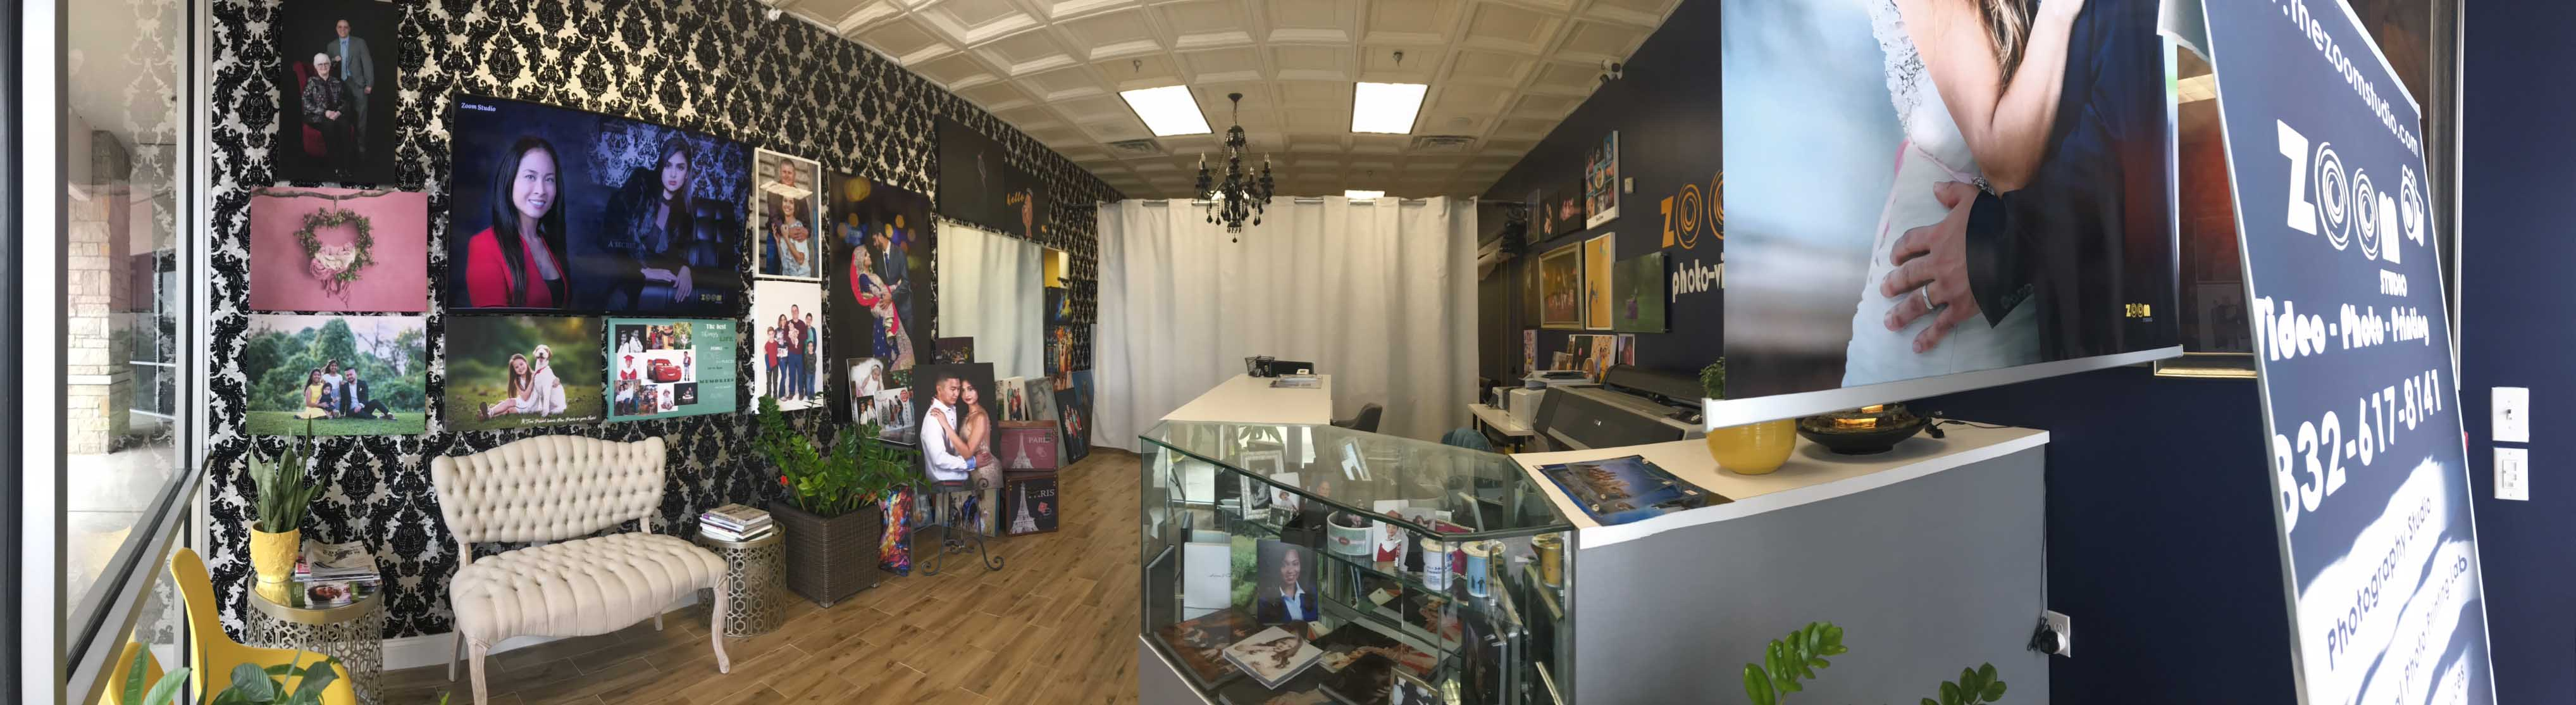 Zoom Studio Pearland